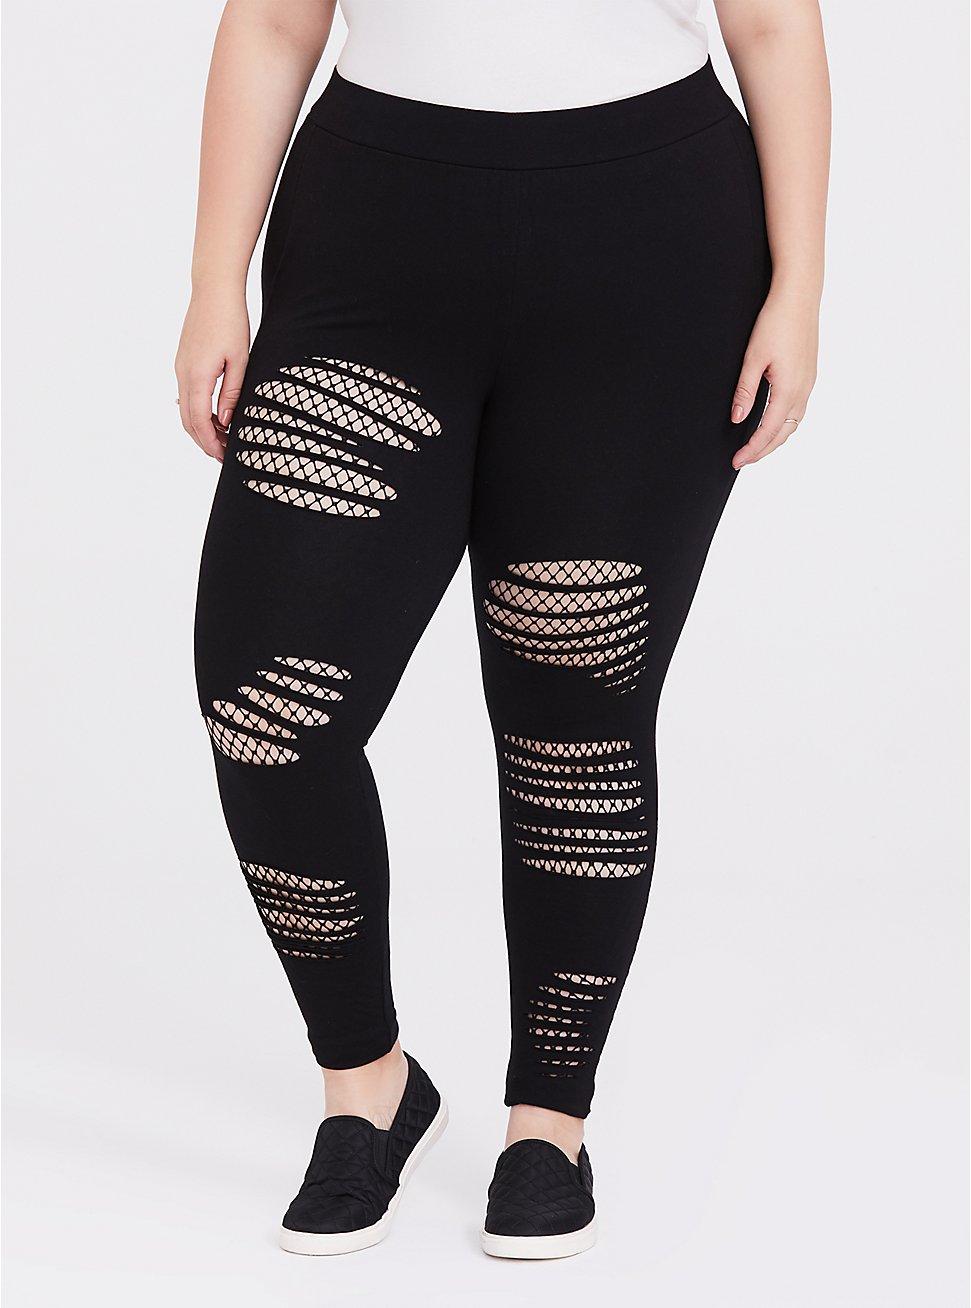 Slim Fix Premium Legging – Slashed Fishnet Underlay Black, BLACK, hi-res